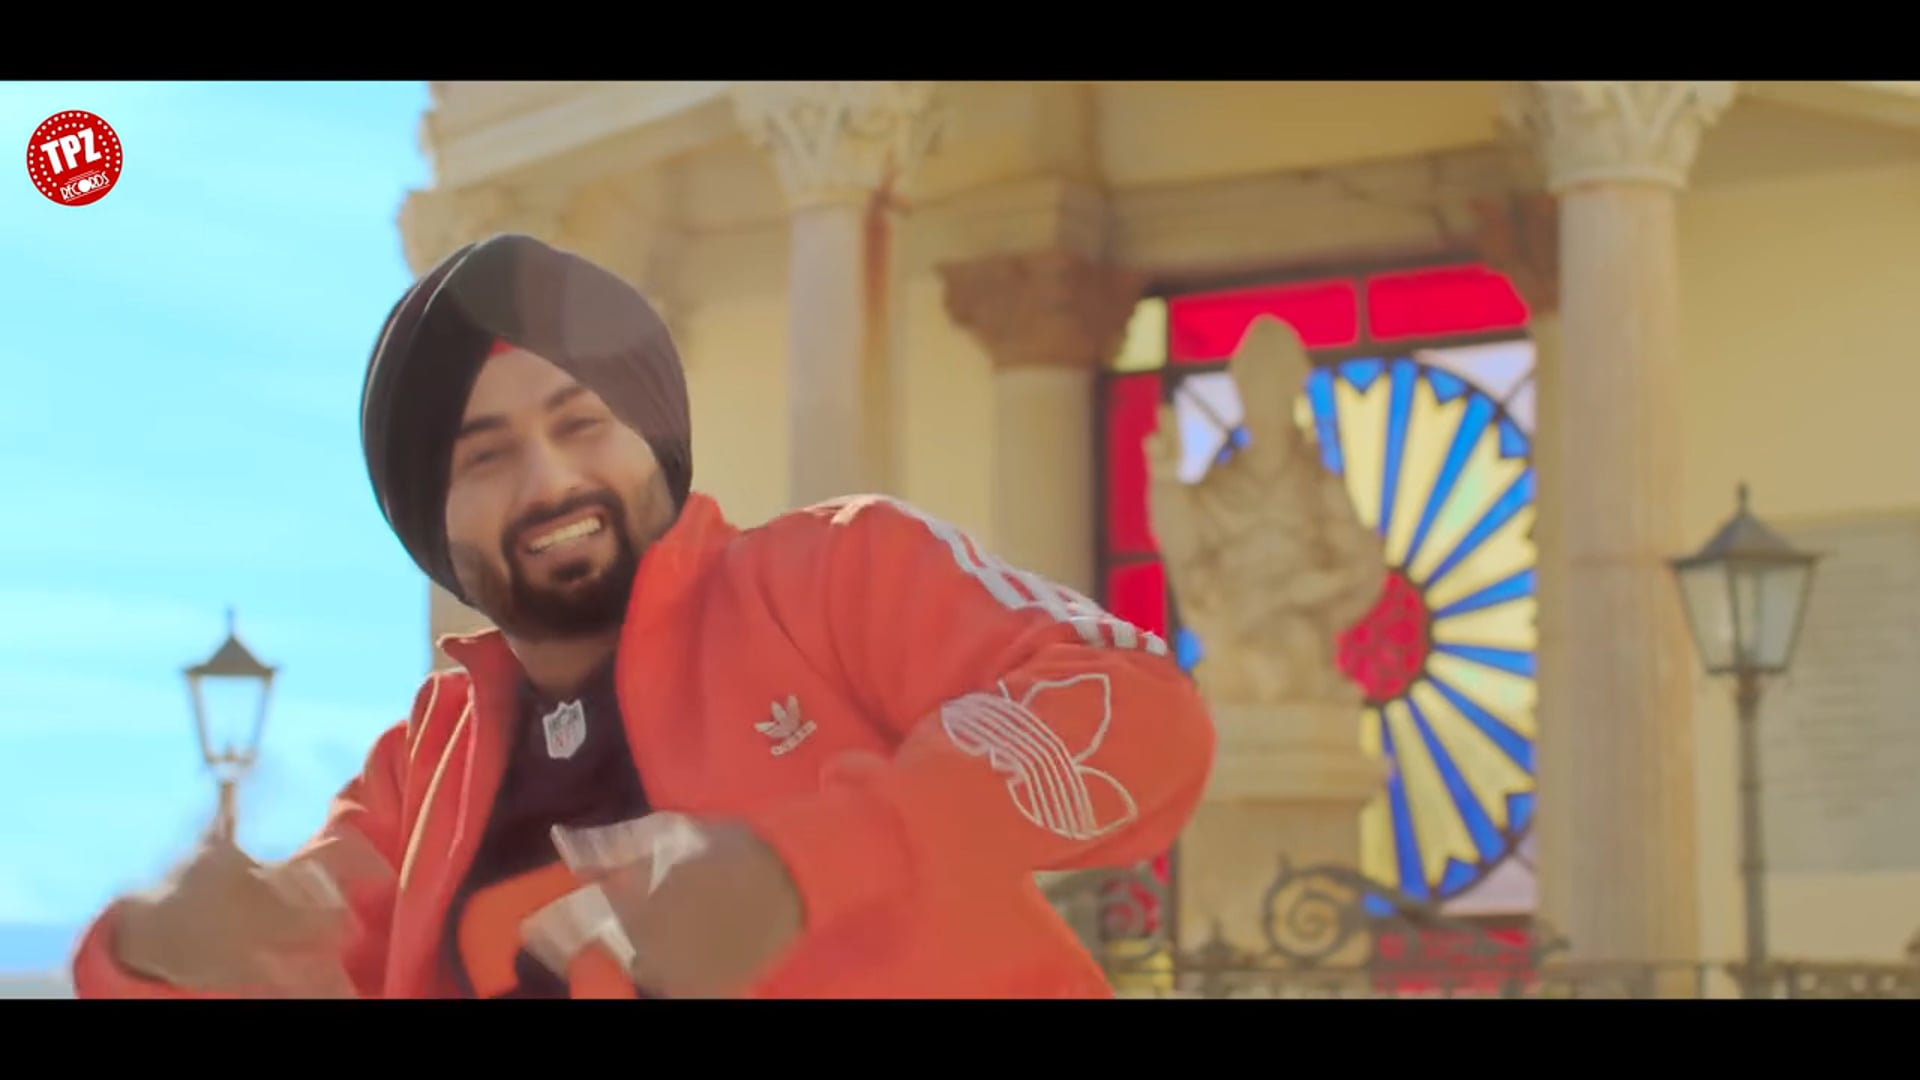 JATTI (Official Video) Satinder Virk - MixSingh - Latest Punjabi Songs 2020 - New Punjabi Songs 2020